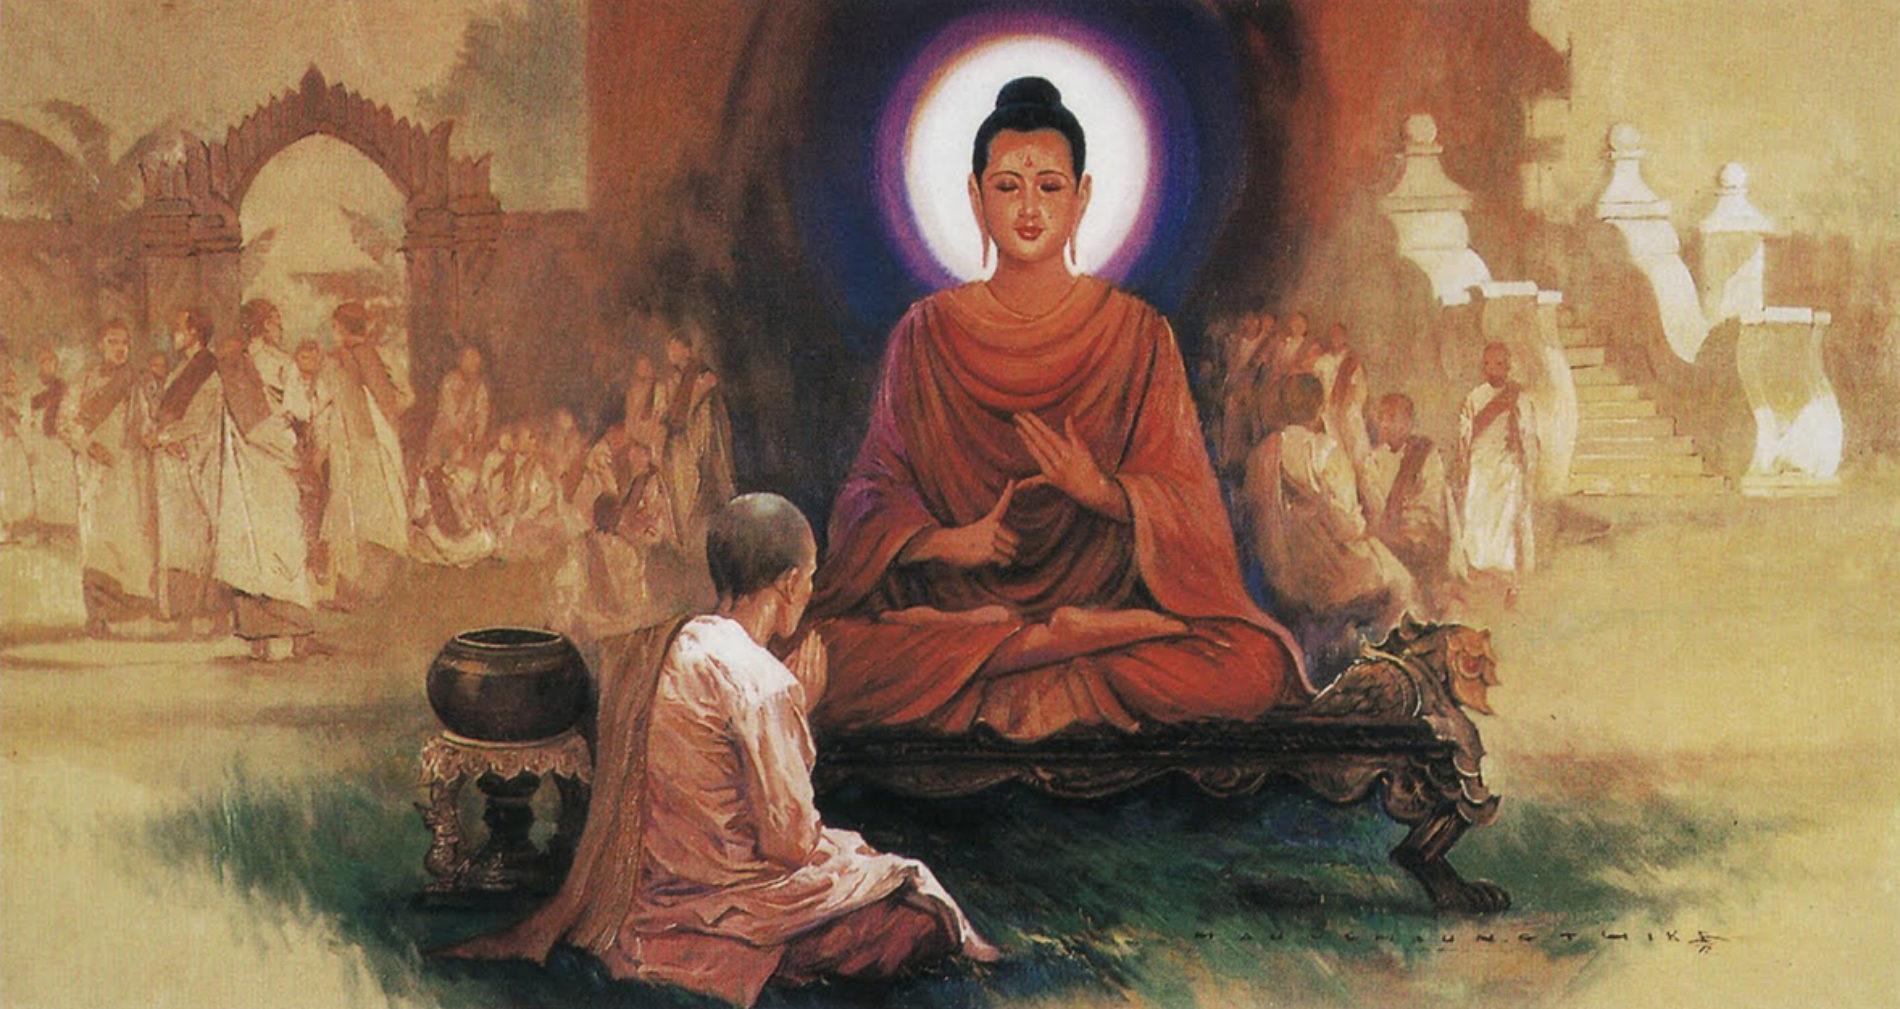 Что такое  Тхеравада? — Маунг Кьяук Сеинн